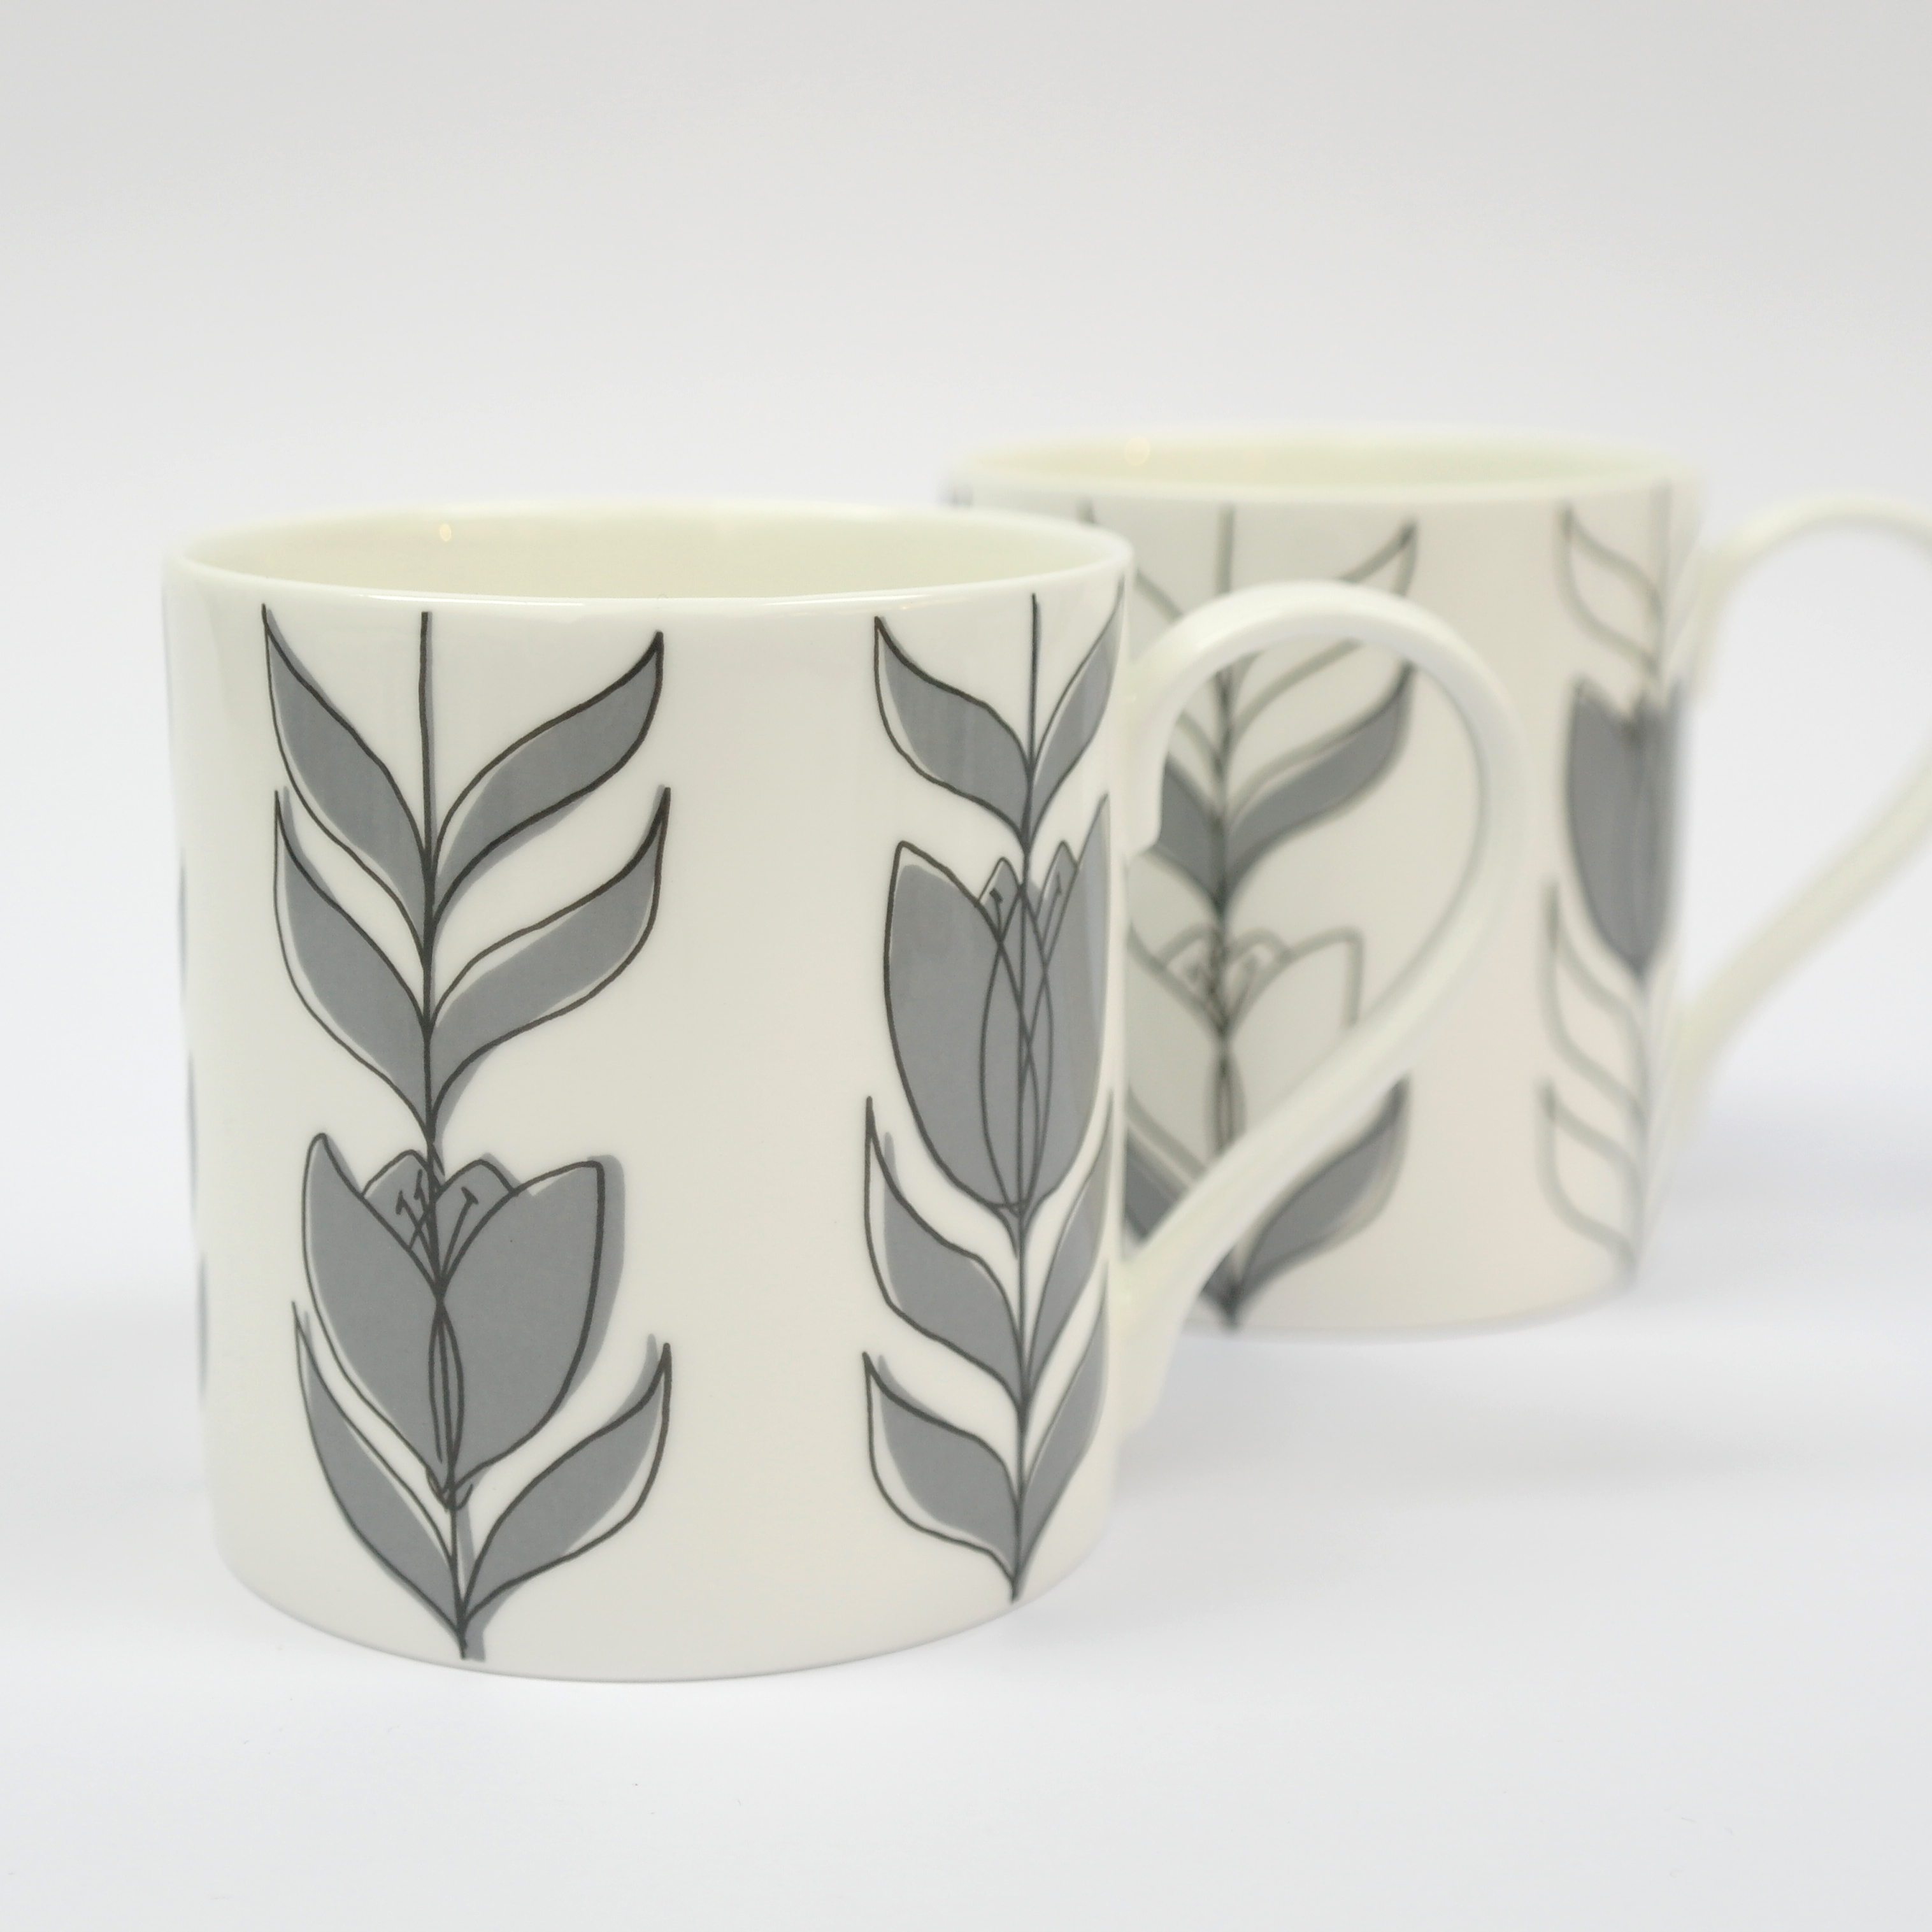 Tulip Linear Closed Mug Boxed (English Fine Bone China) Available in 6 Colourways